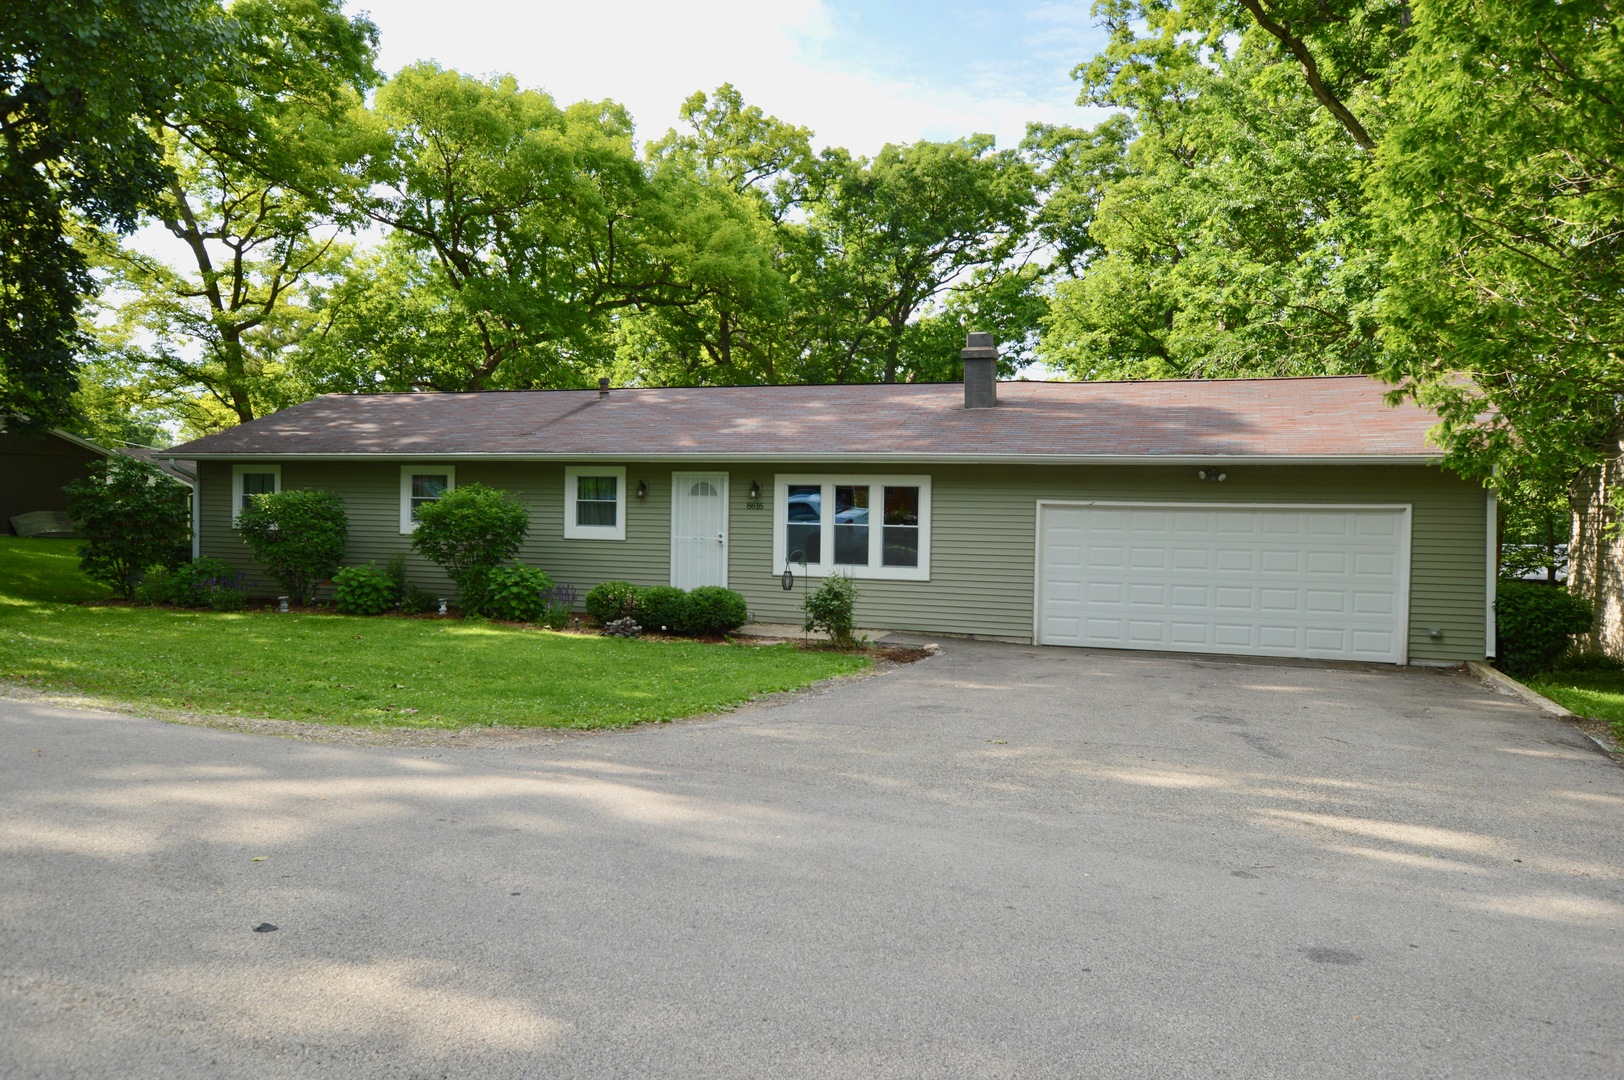 8616 Alden Road, Wonder Lake, IL 60097